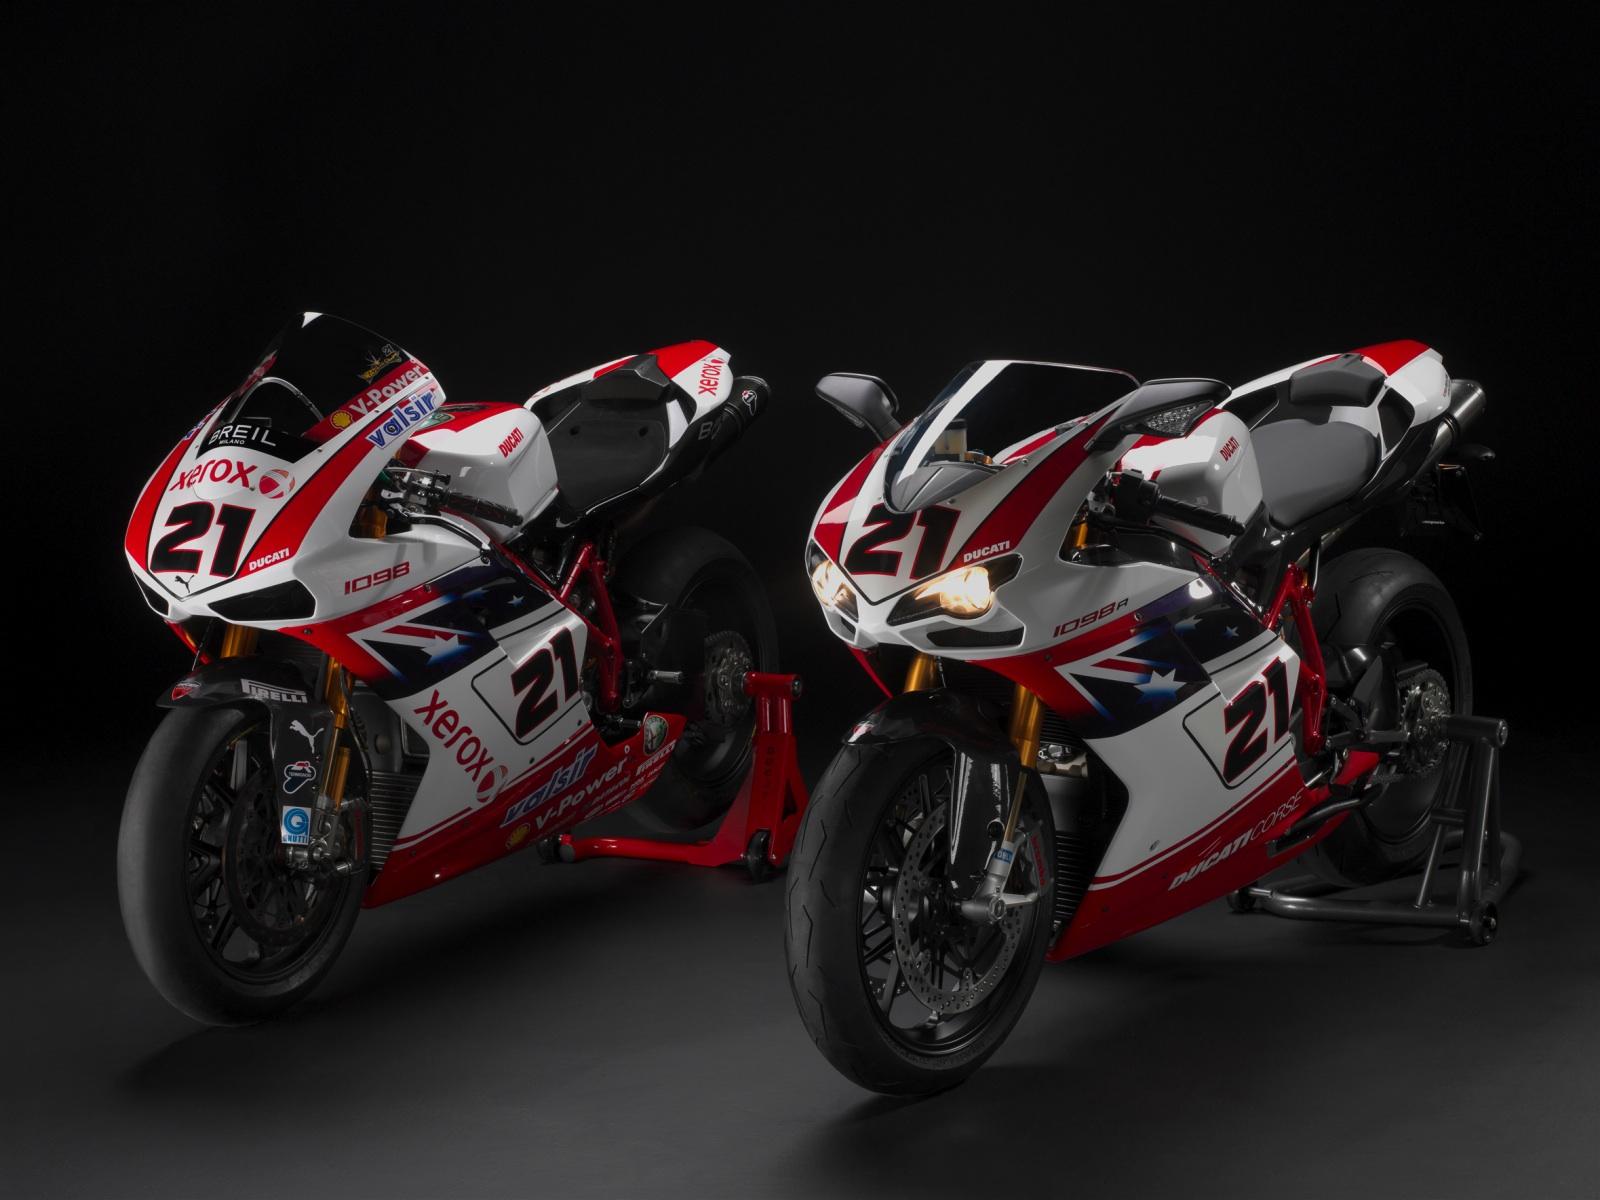 Ducati 1098R Bayliss Race Vs Street Wallpapers Ducati 1098R Bayliss 1600x1200